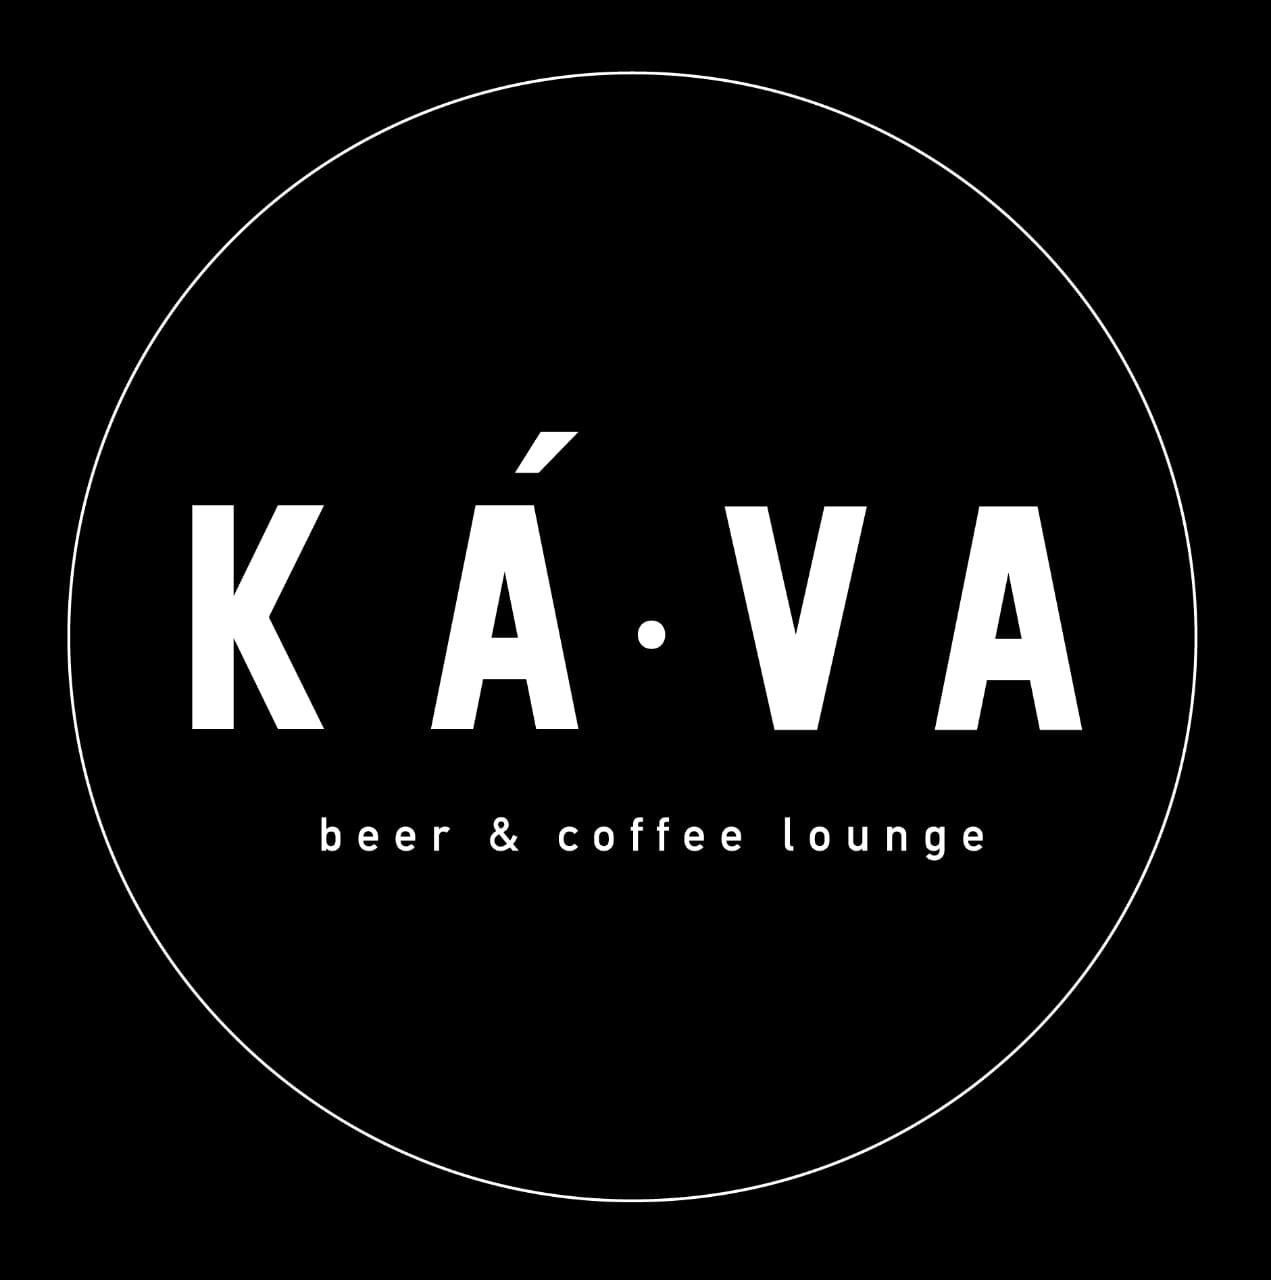 Ká-Va Beer & Coffee Lounge